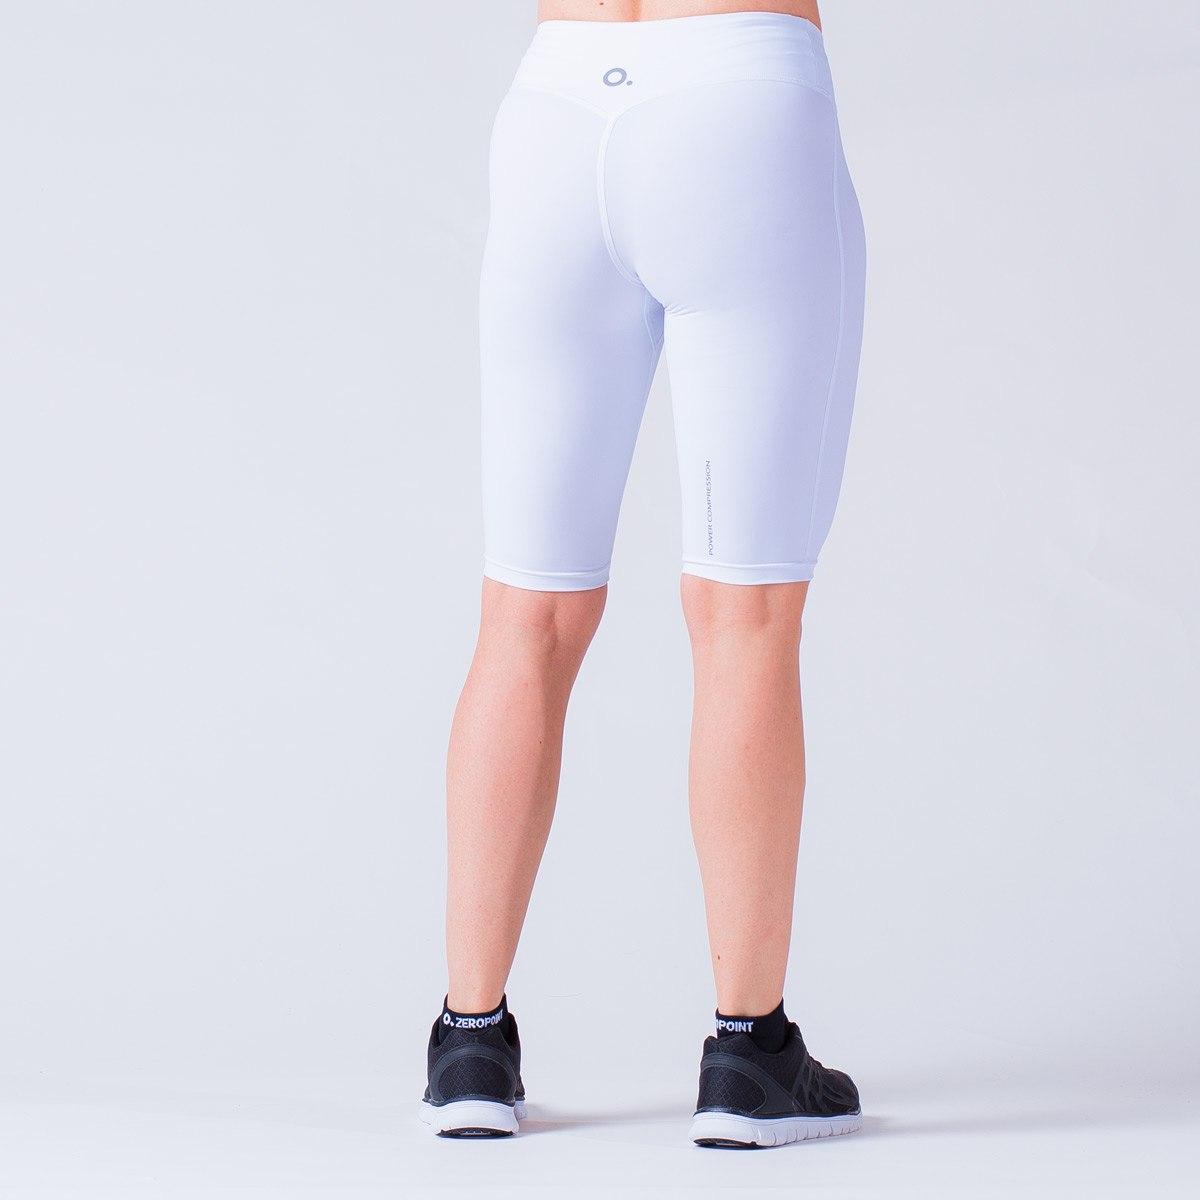 compression-shorts-white-4. Zeropoint compression shorts women 1781e2d992